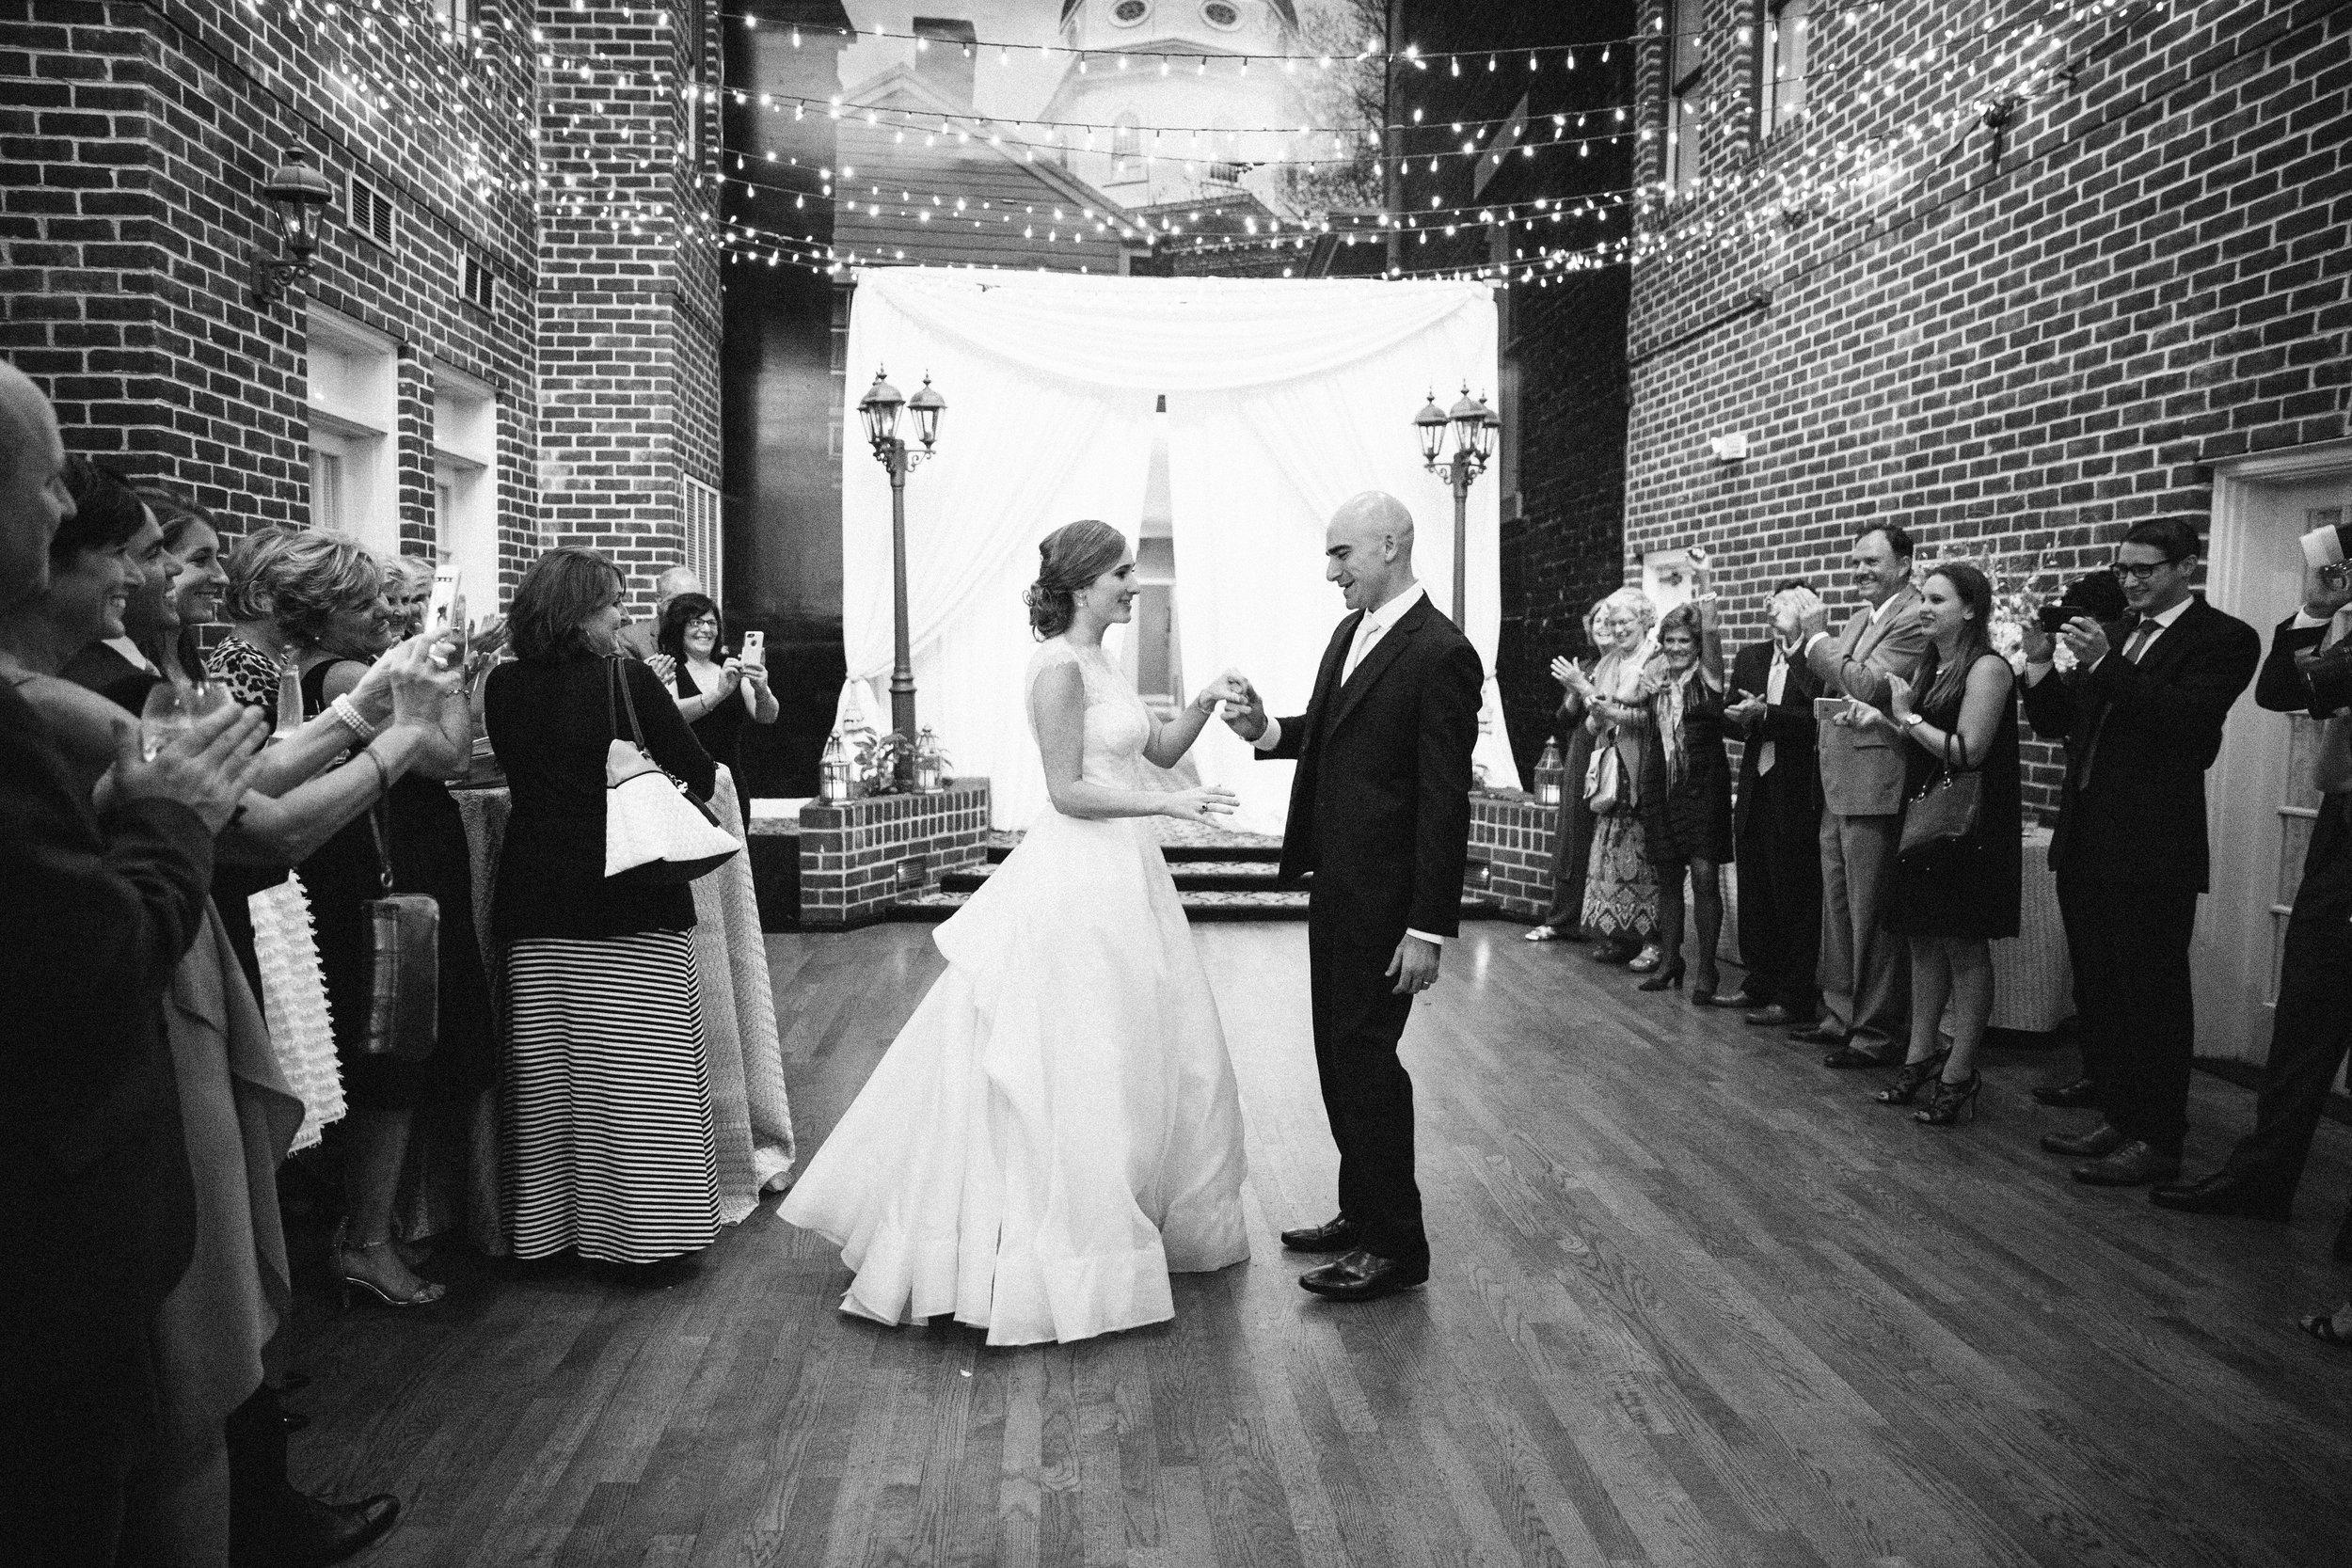 093-Governor-Calvert-Annapolis-Maryland-Wedding-MA17.jpg